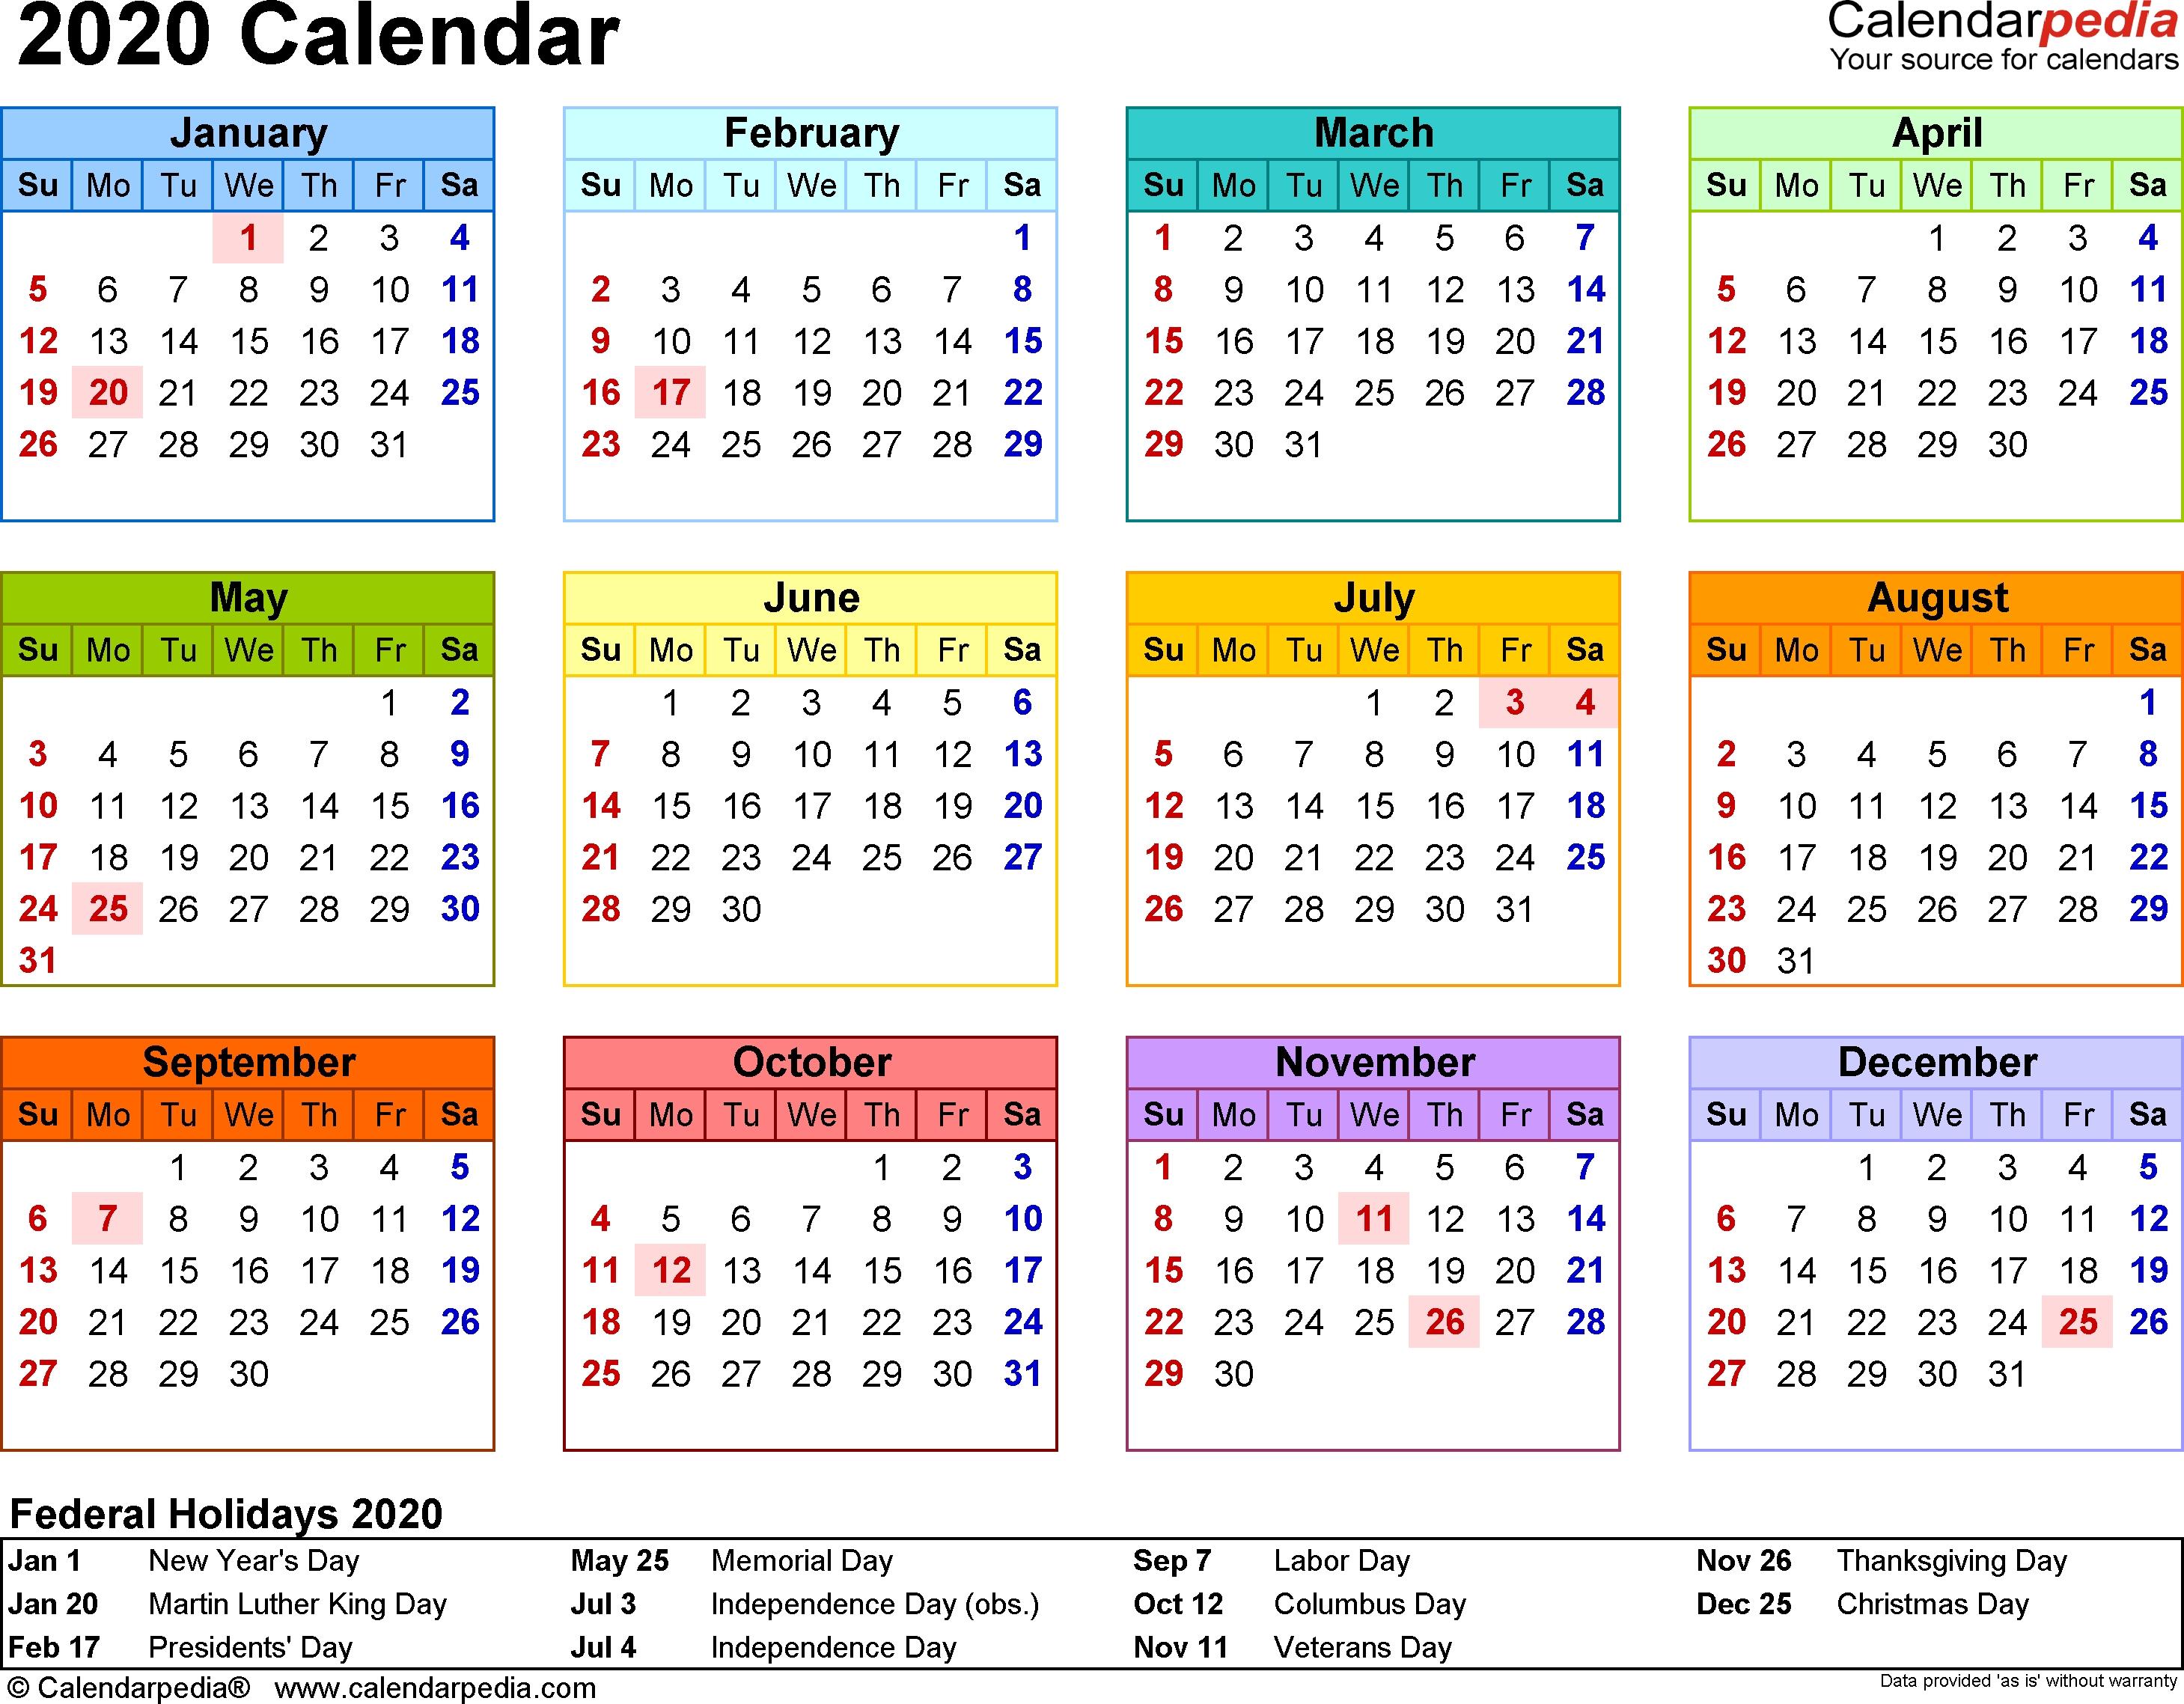 2020 Calendar Pdf - 17 Free Printable Calendar Templates_Blank Calendar Pdf 2020